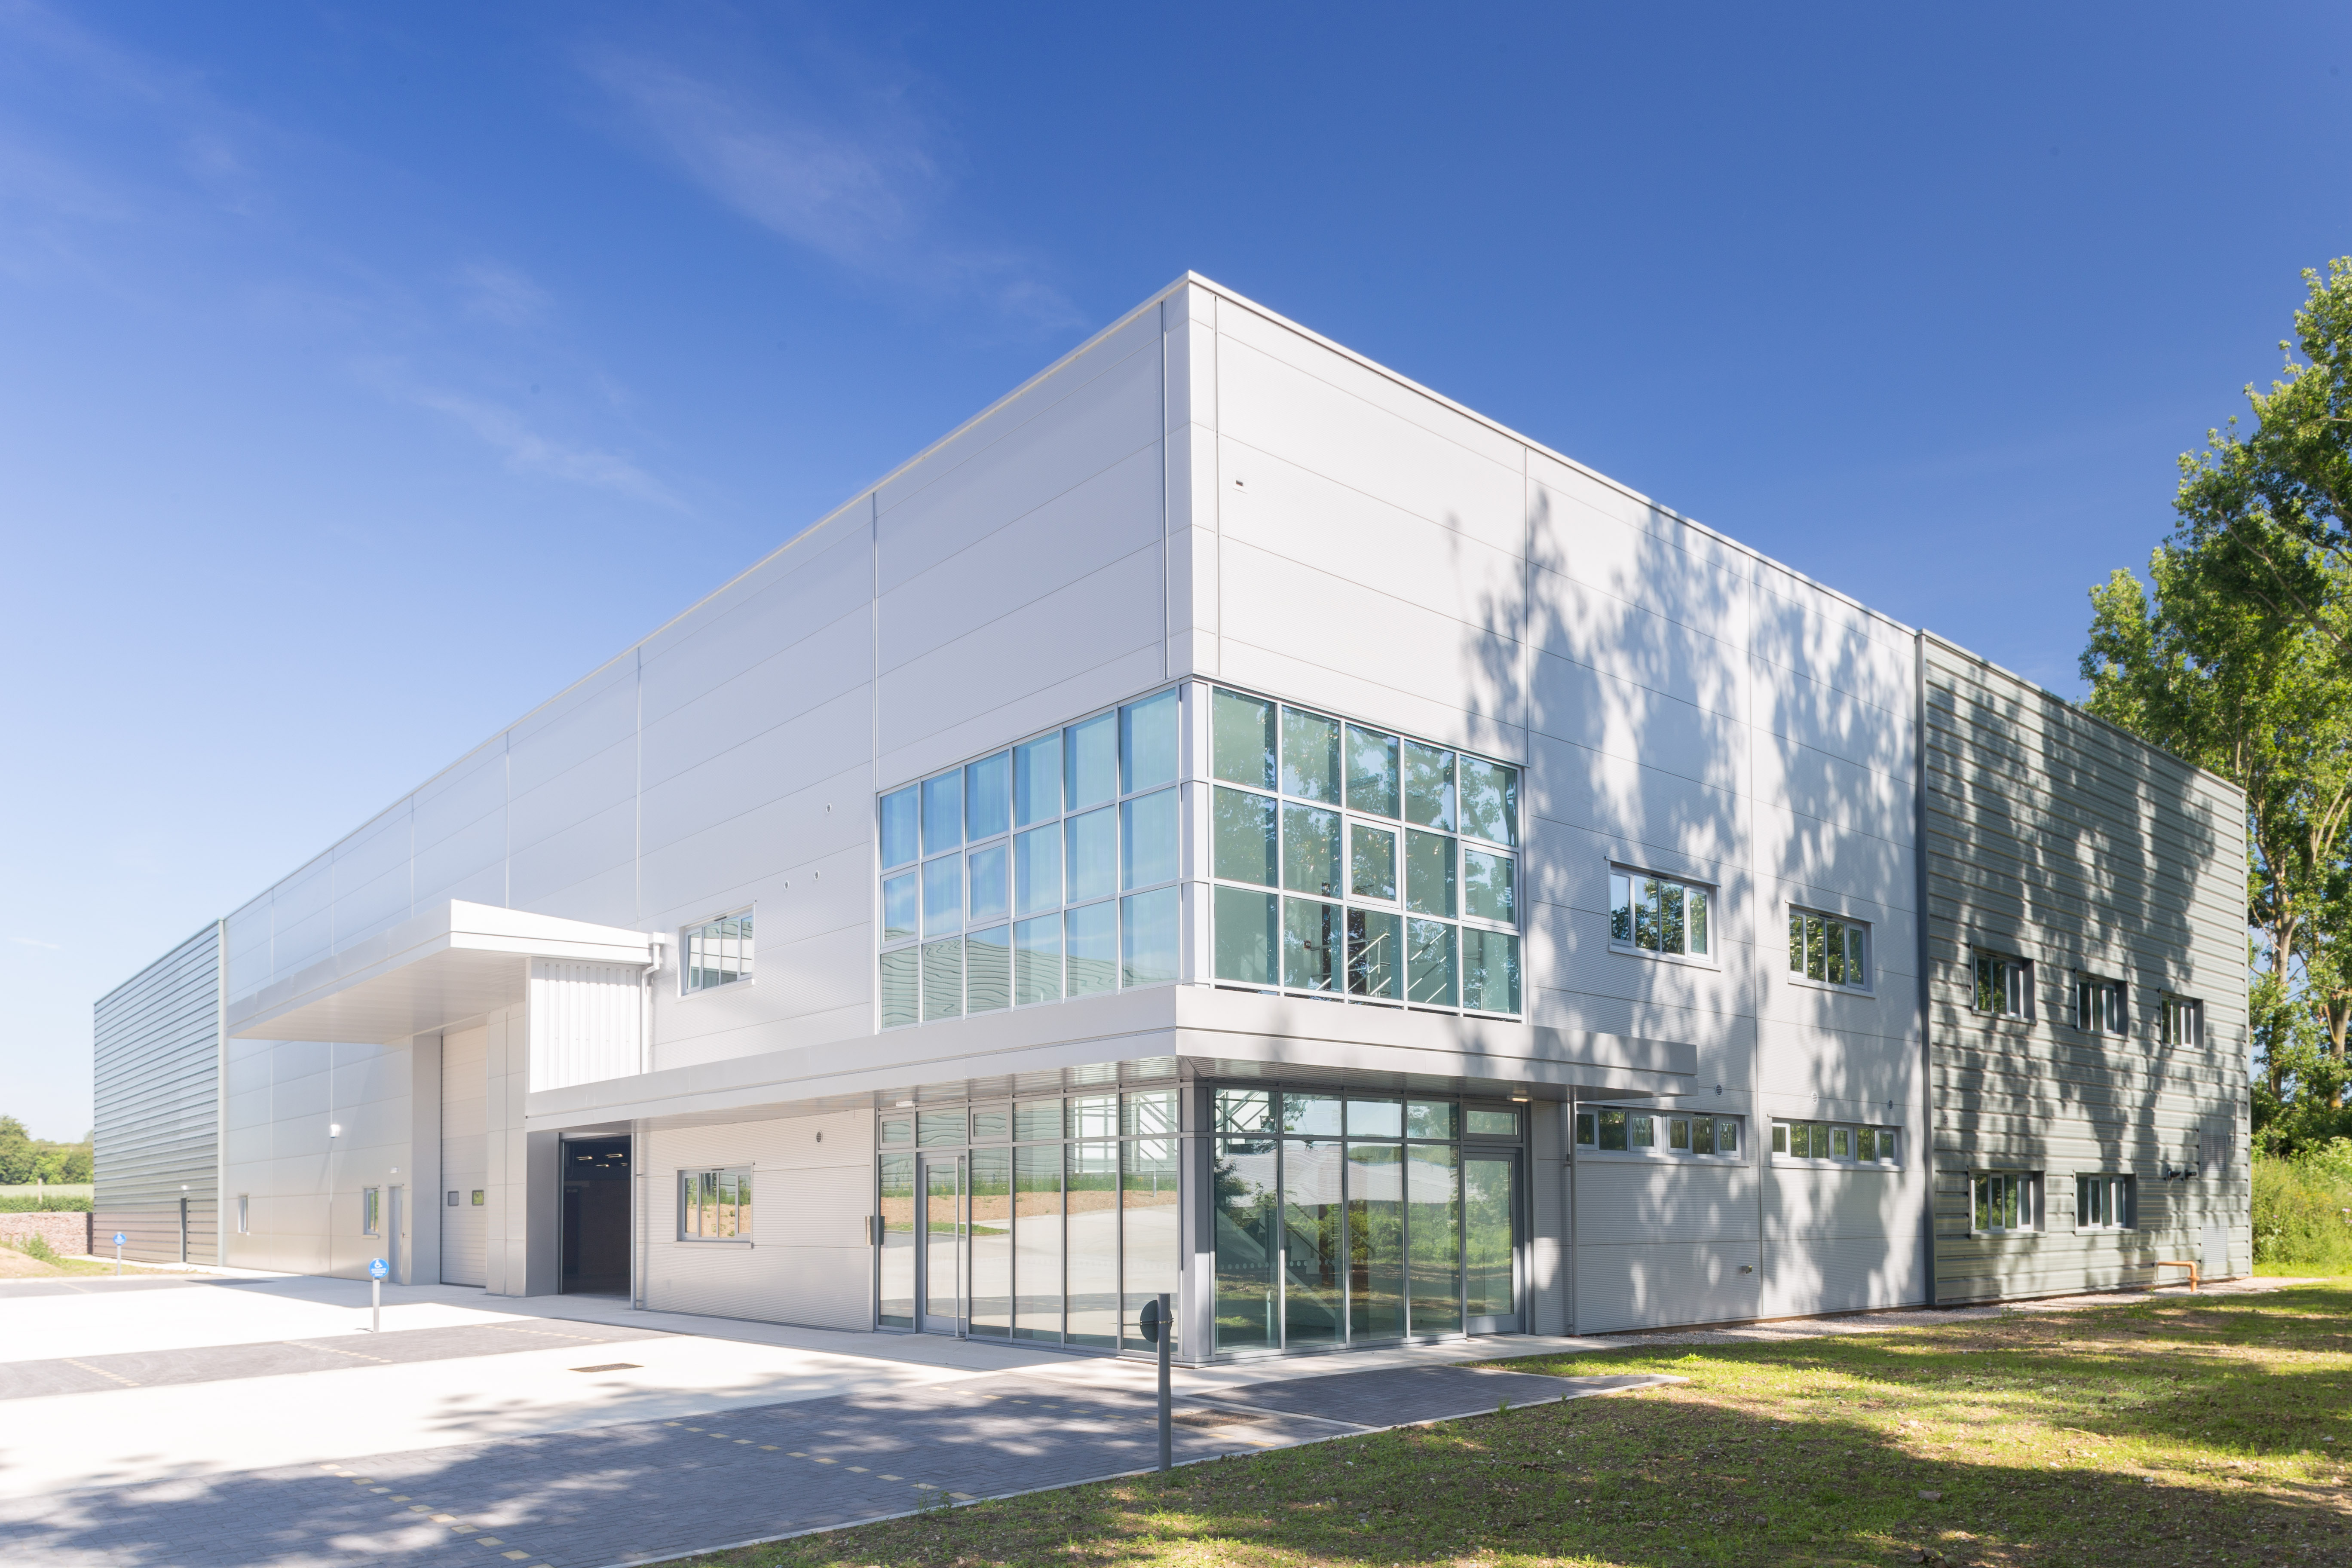 Aluminium Windows & Doors for Warehouse & Offices